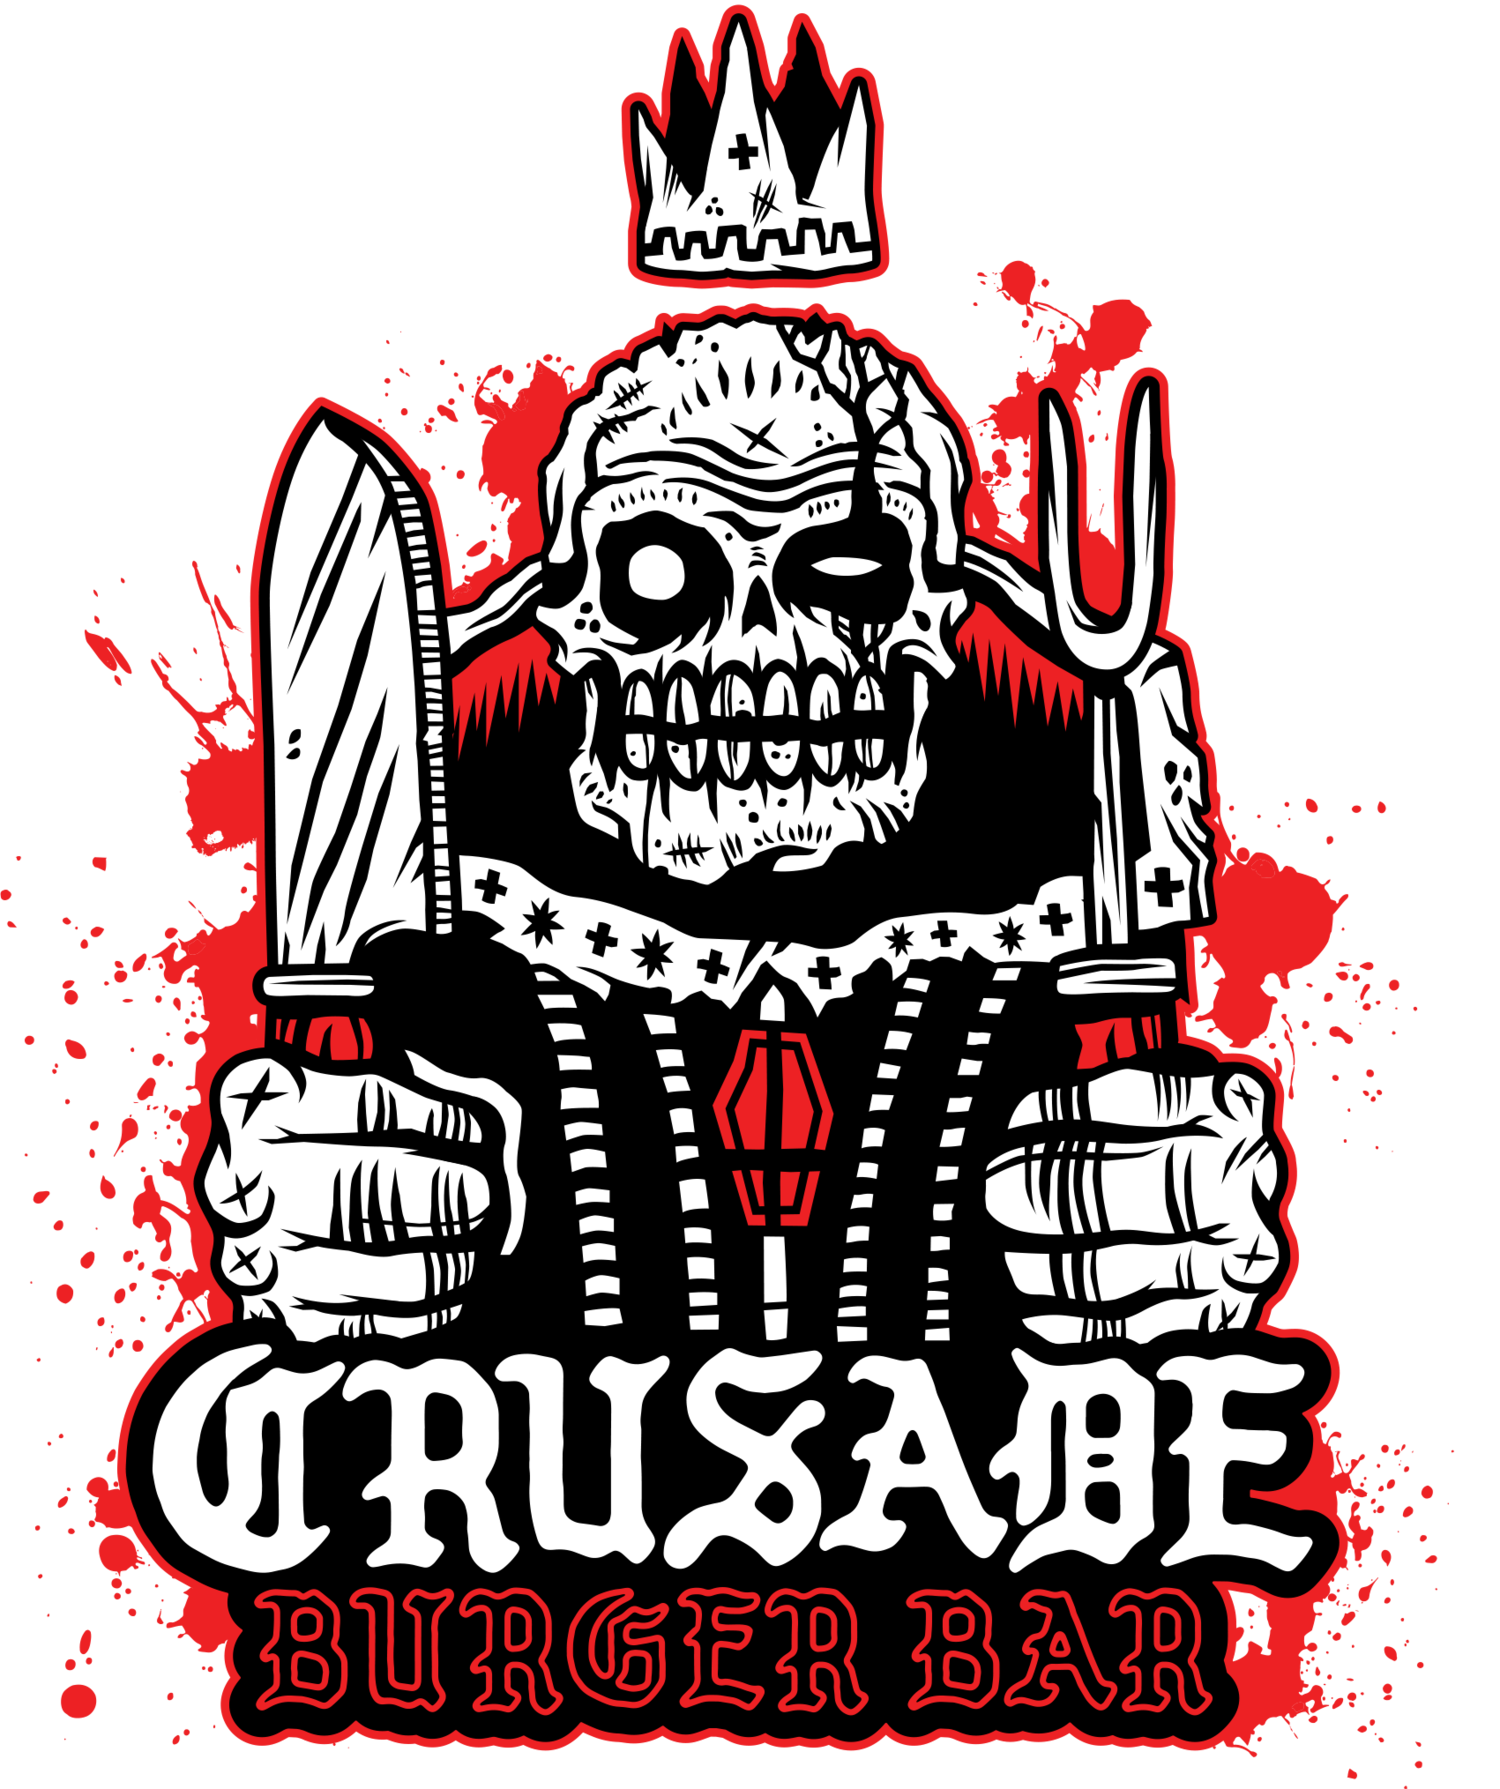 www.crusadeyorkville.com